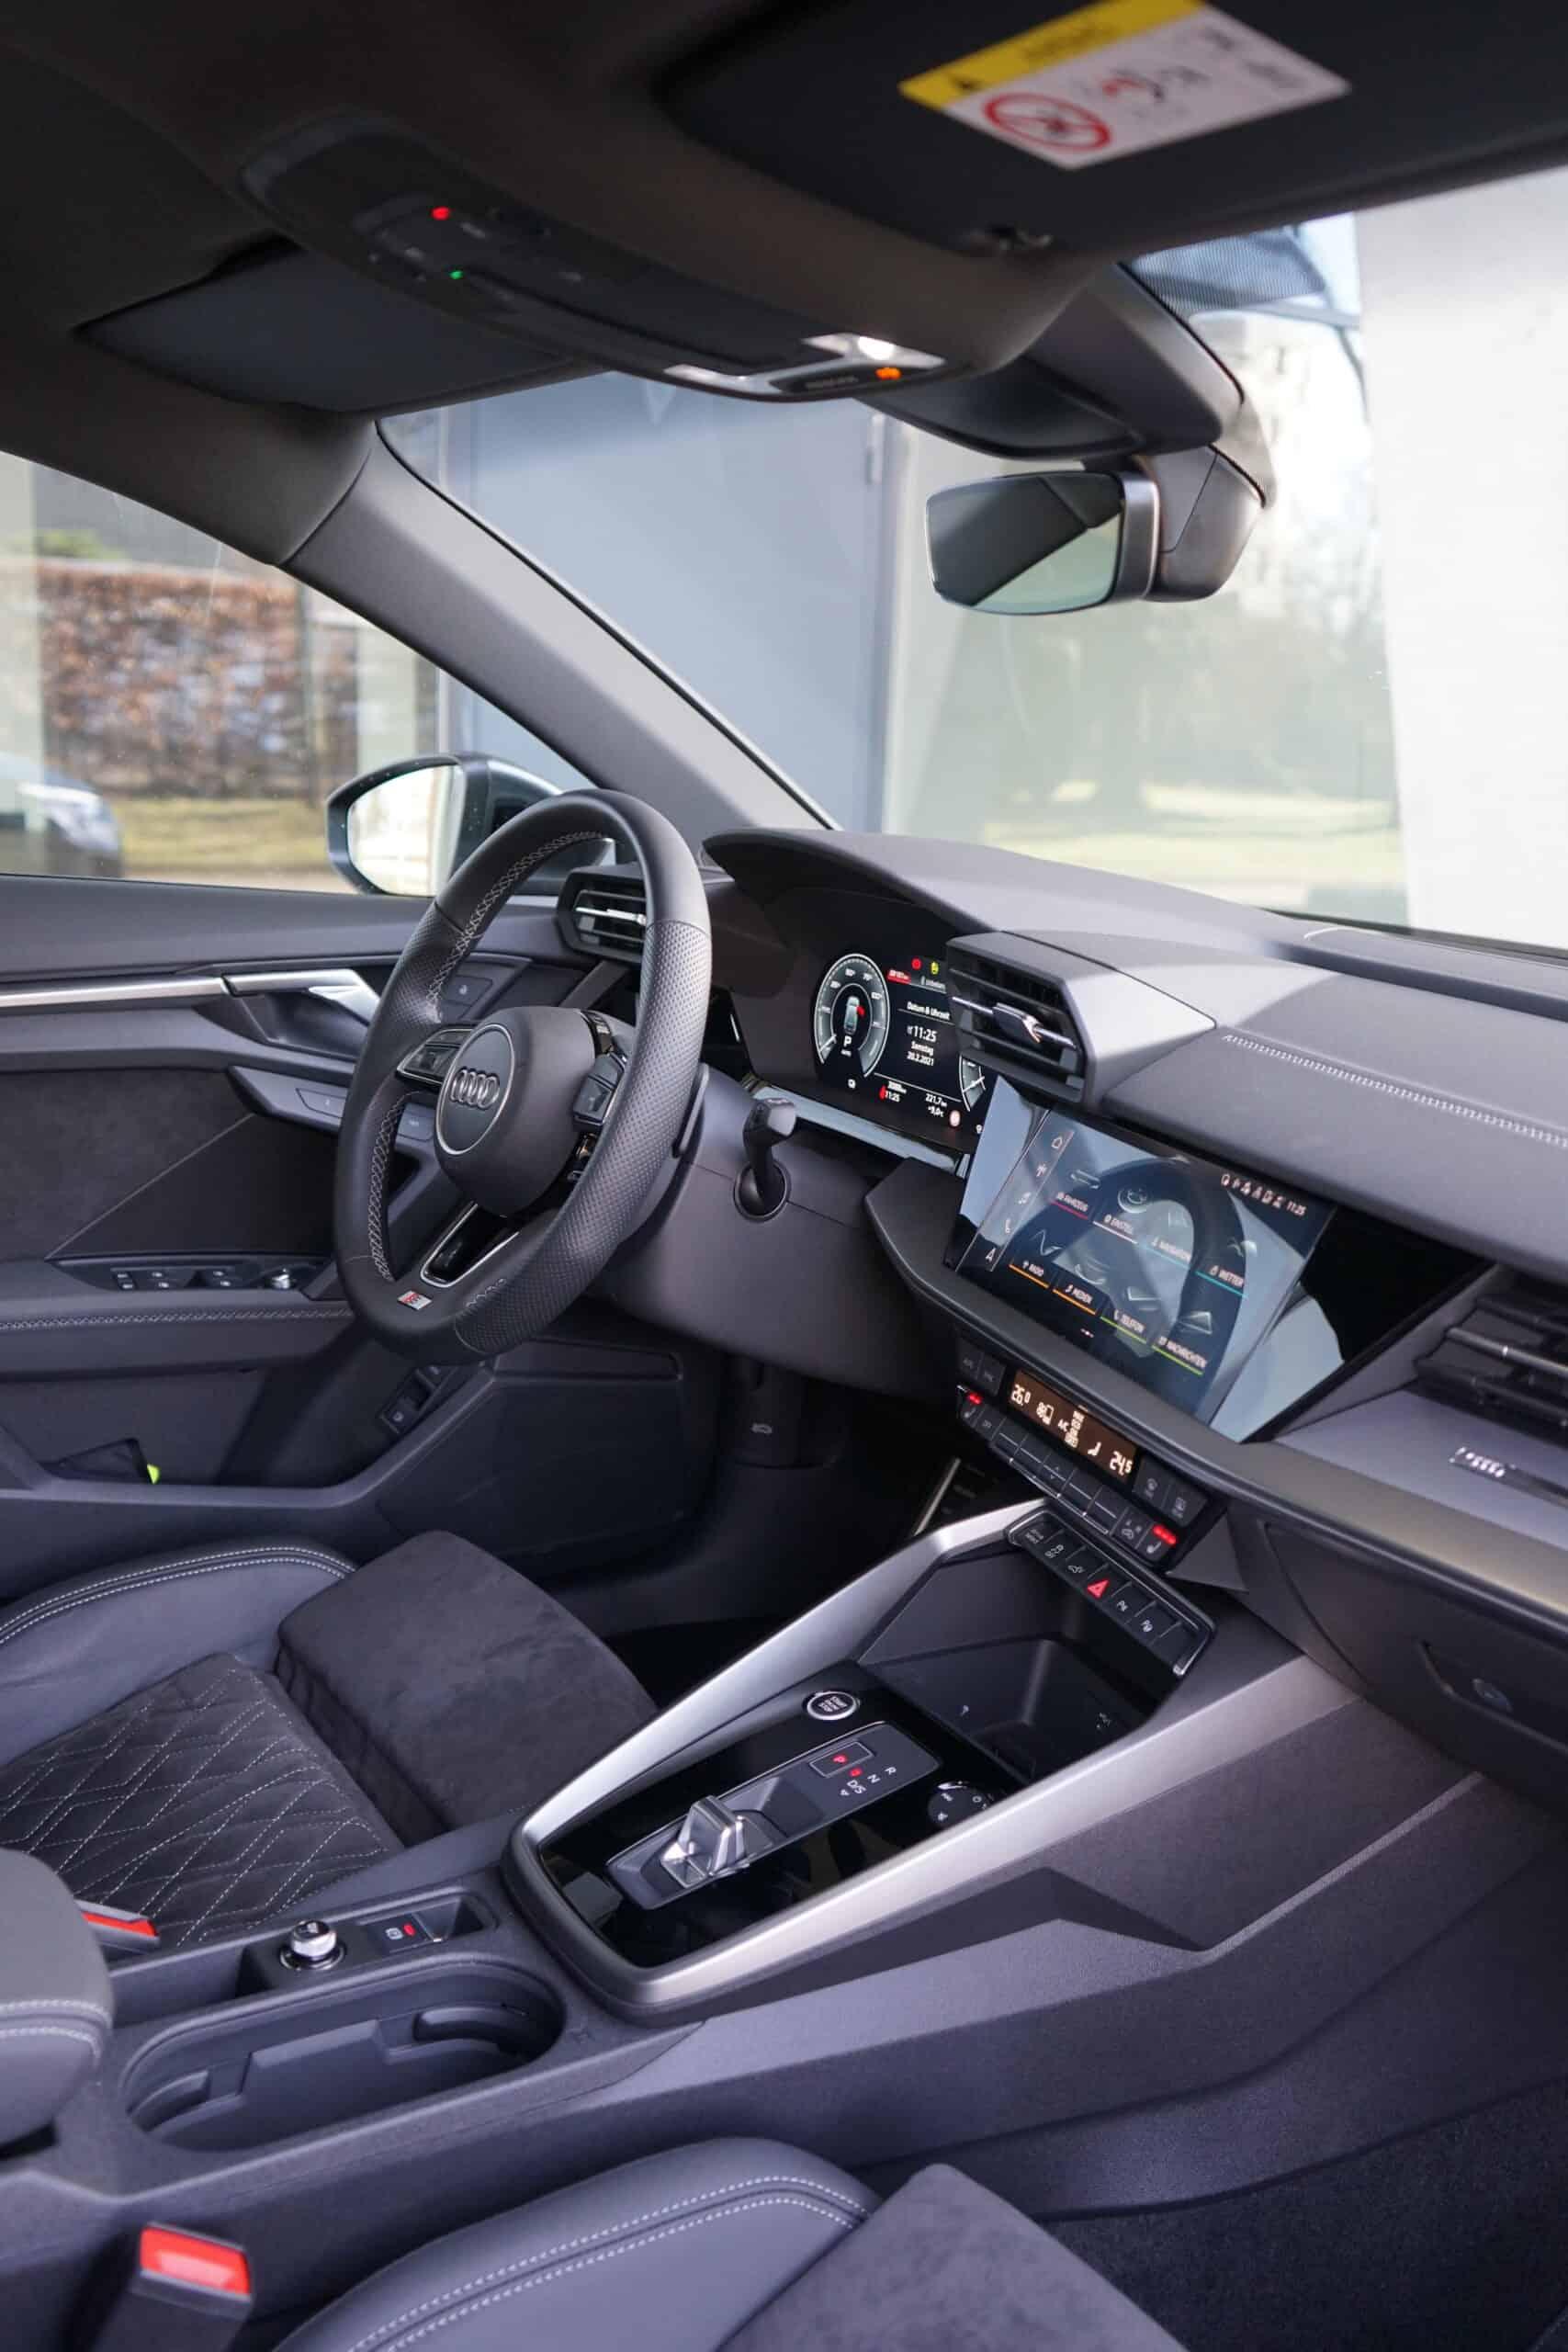 (2021) Audi A3 40 TFSI e - Was bringt der E-Motor?